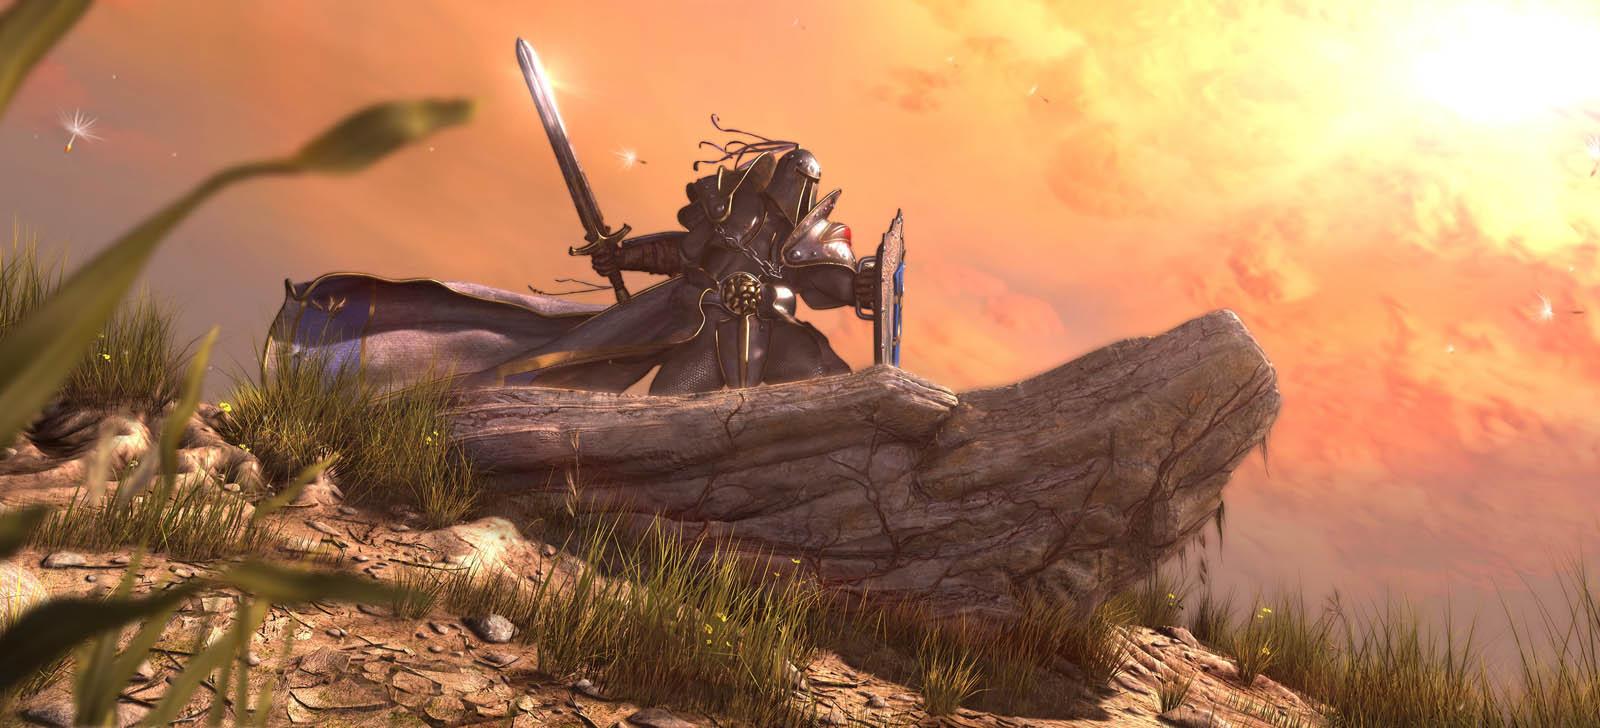 Warcraft 3 - Knight